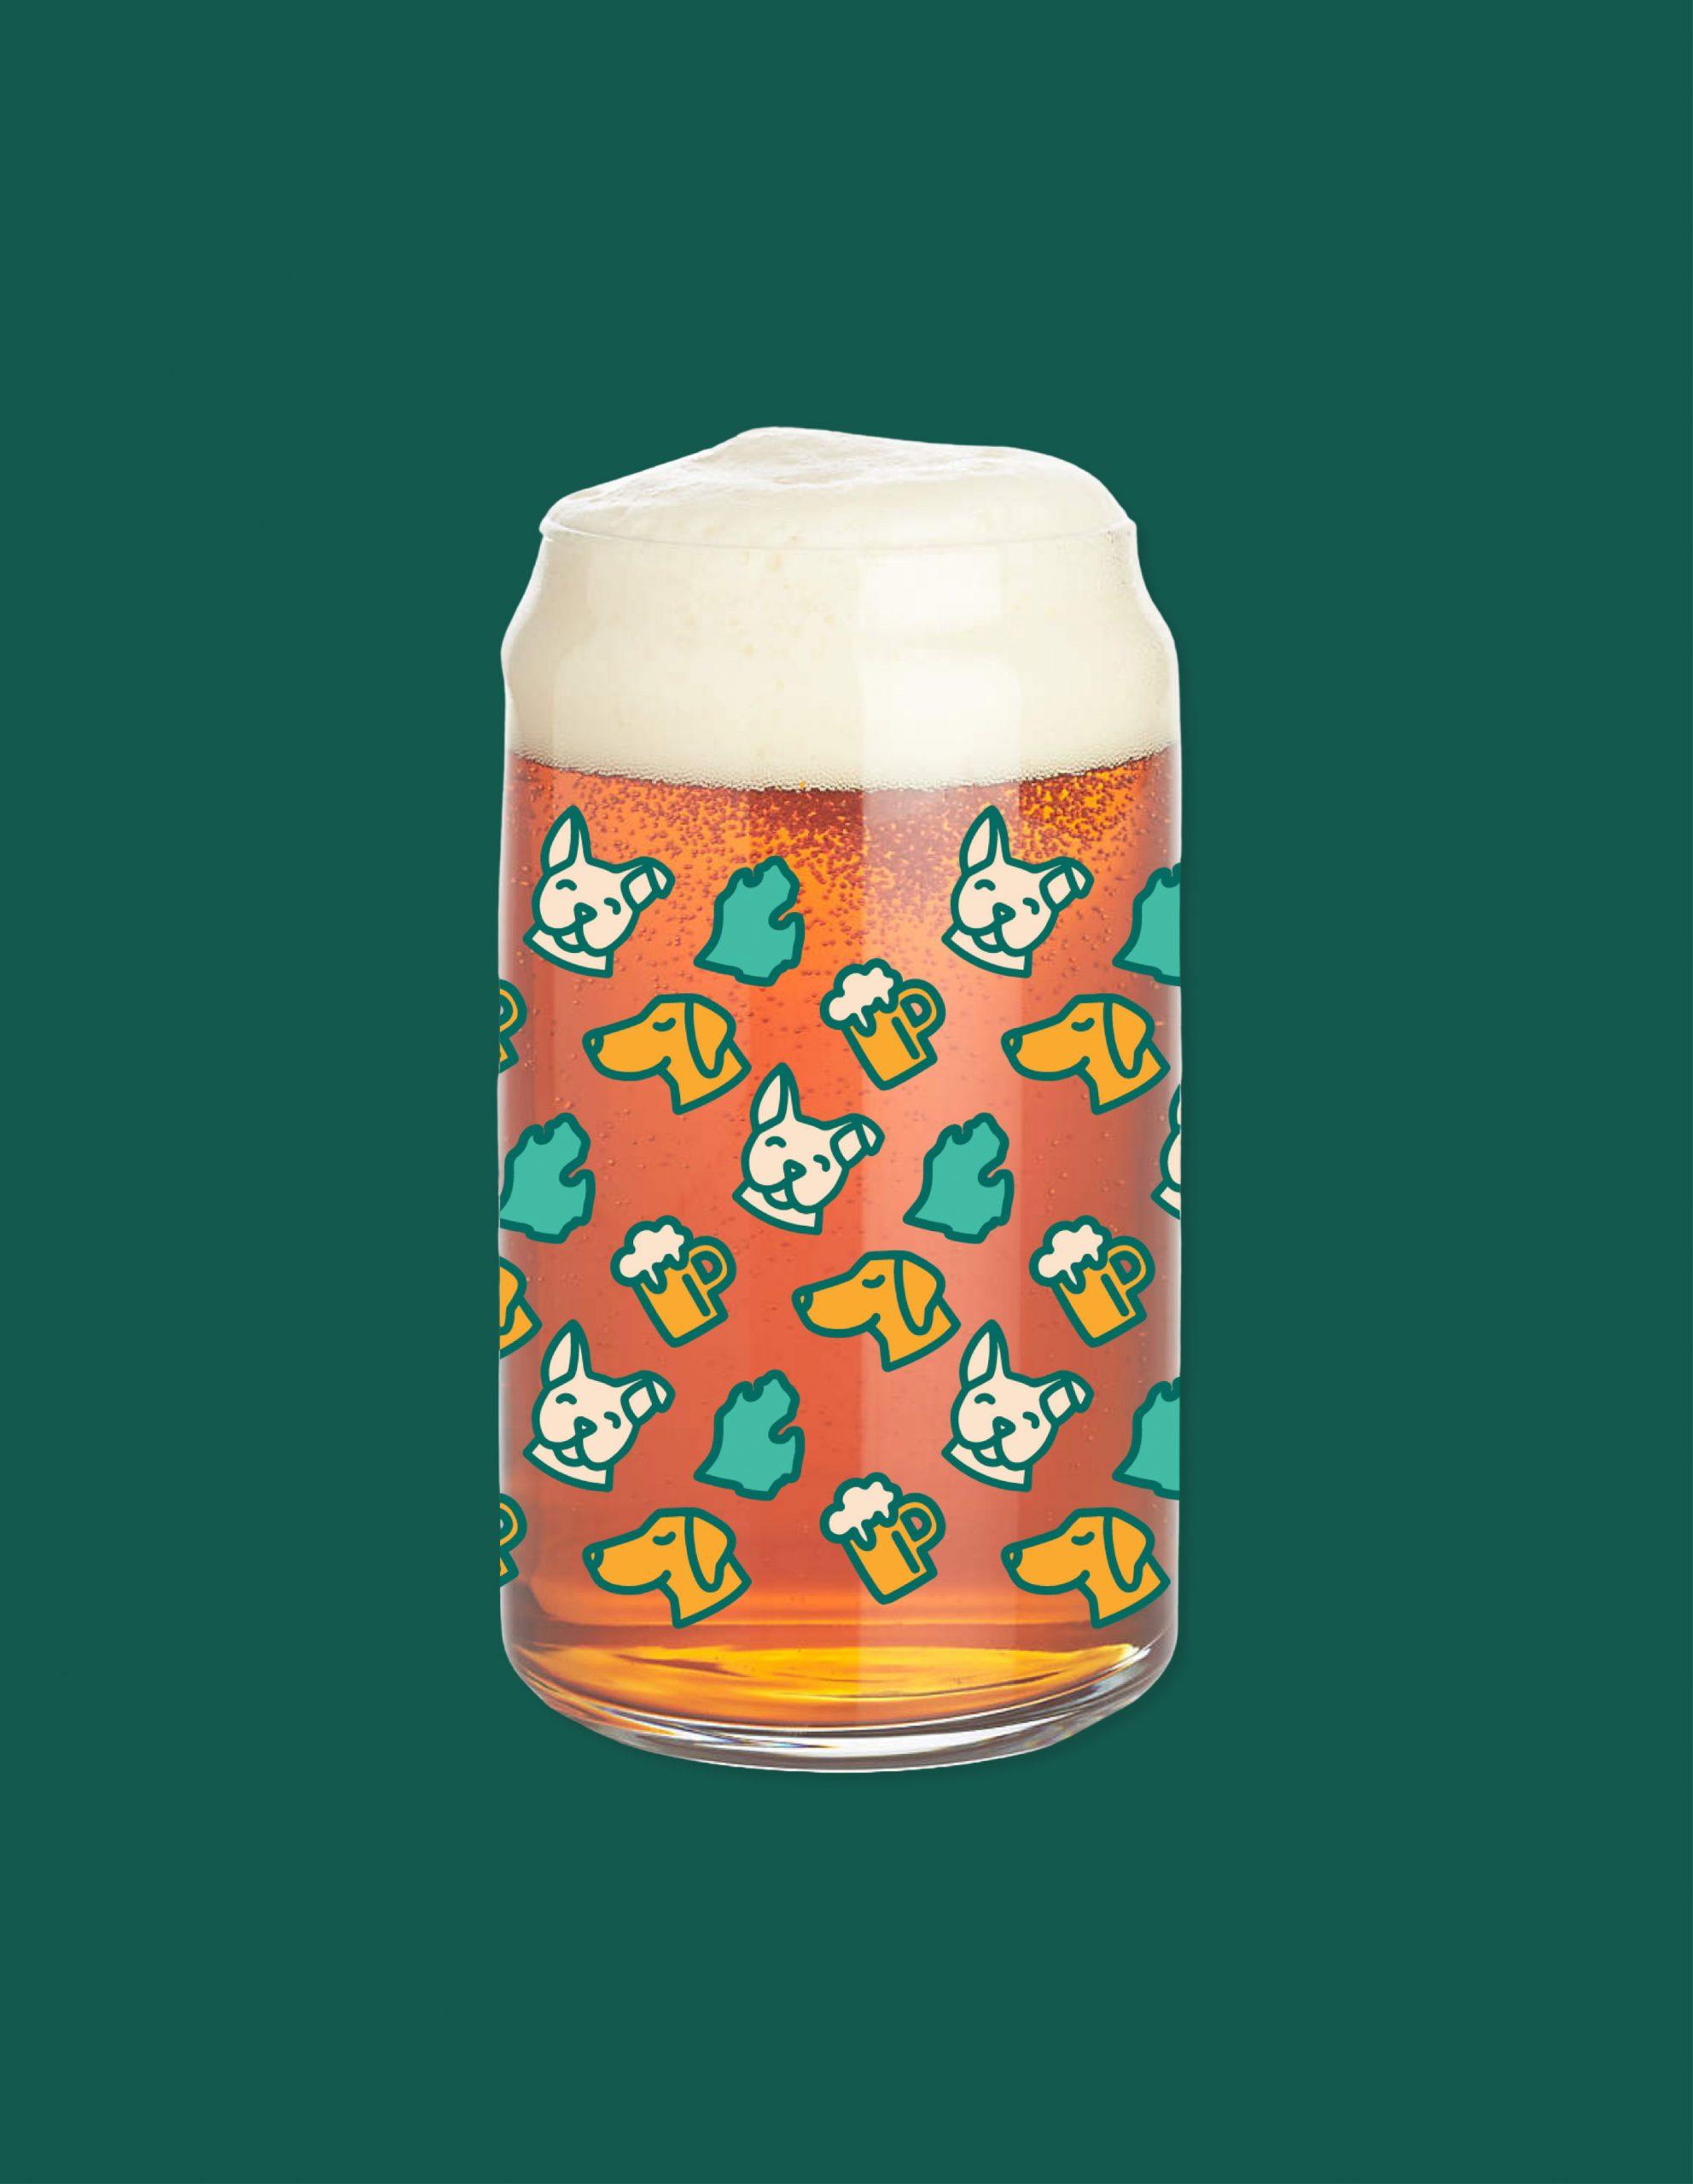 Beer mug with dog and Michigan pattern